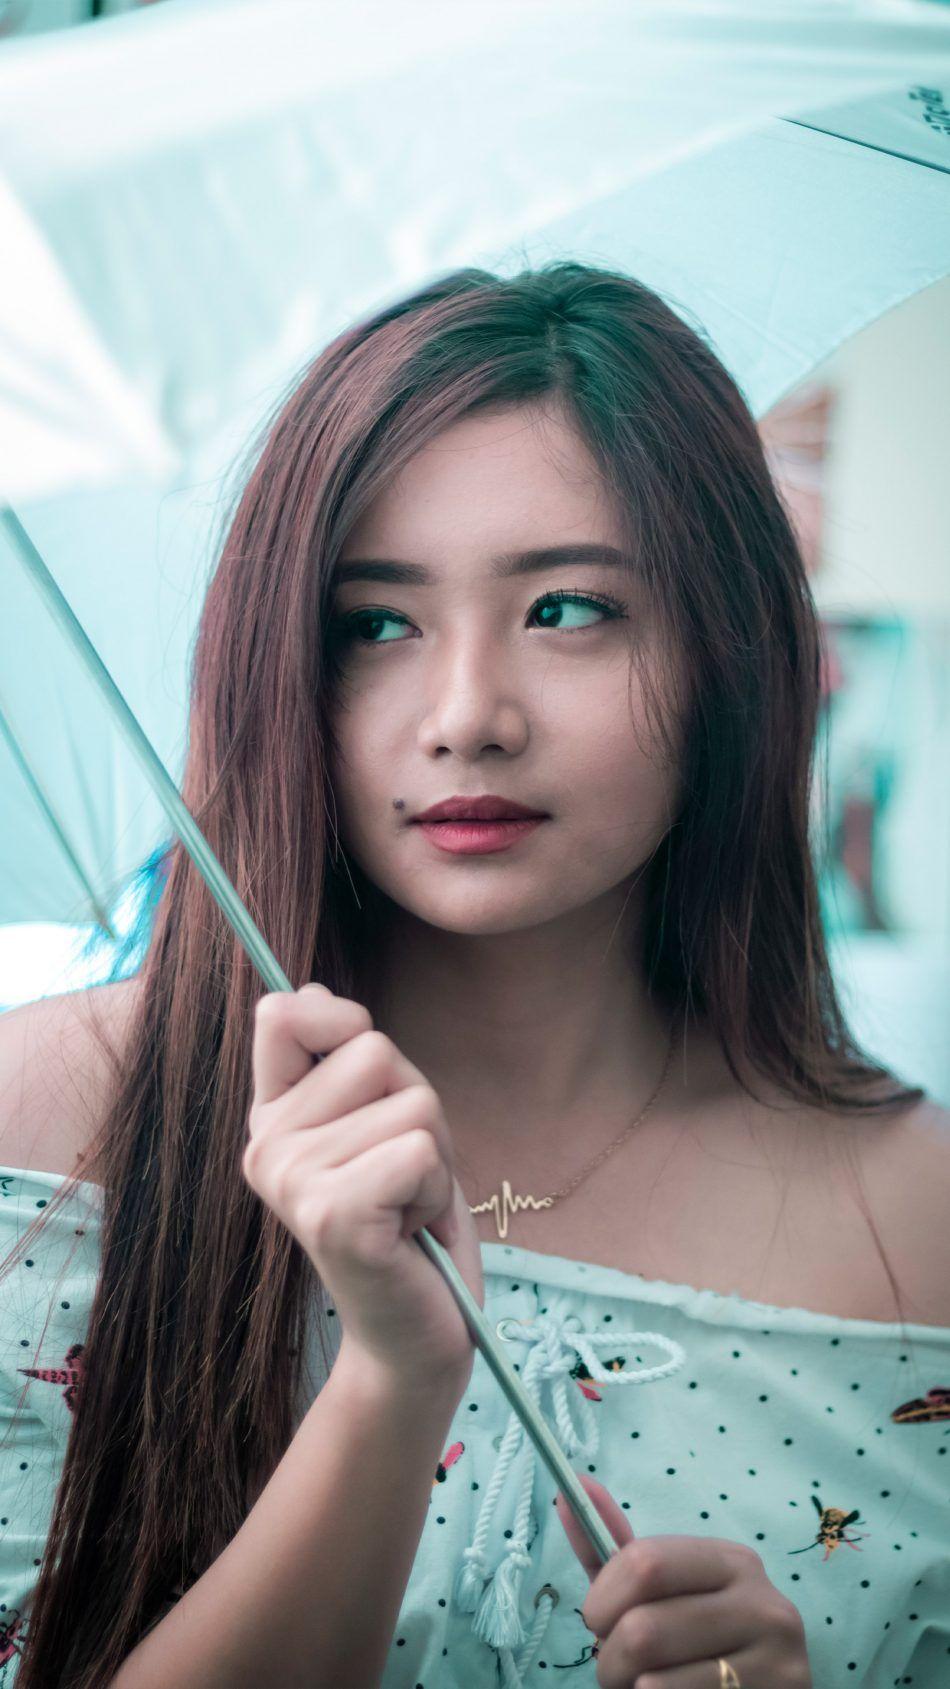 Cute Asian Model Umbrella Photography 4k Ultra Hd Mobile Wallpaper Umbrella Photography Asian Model Photography 4k